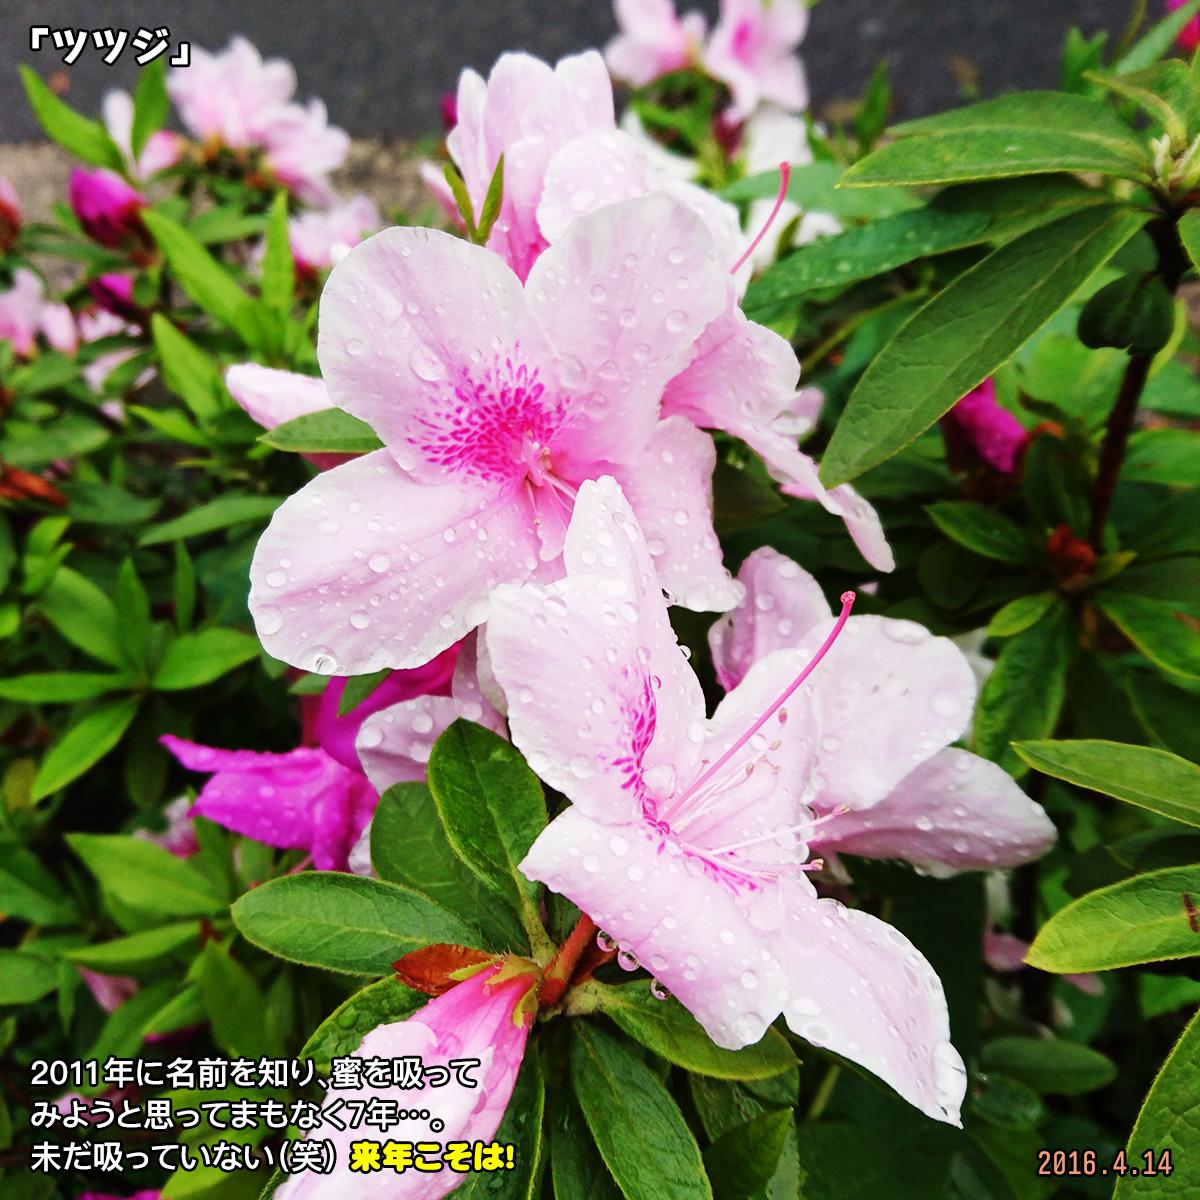 DSC_0467_20171230215716167.jpg